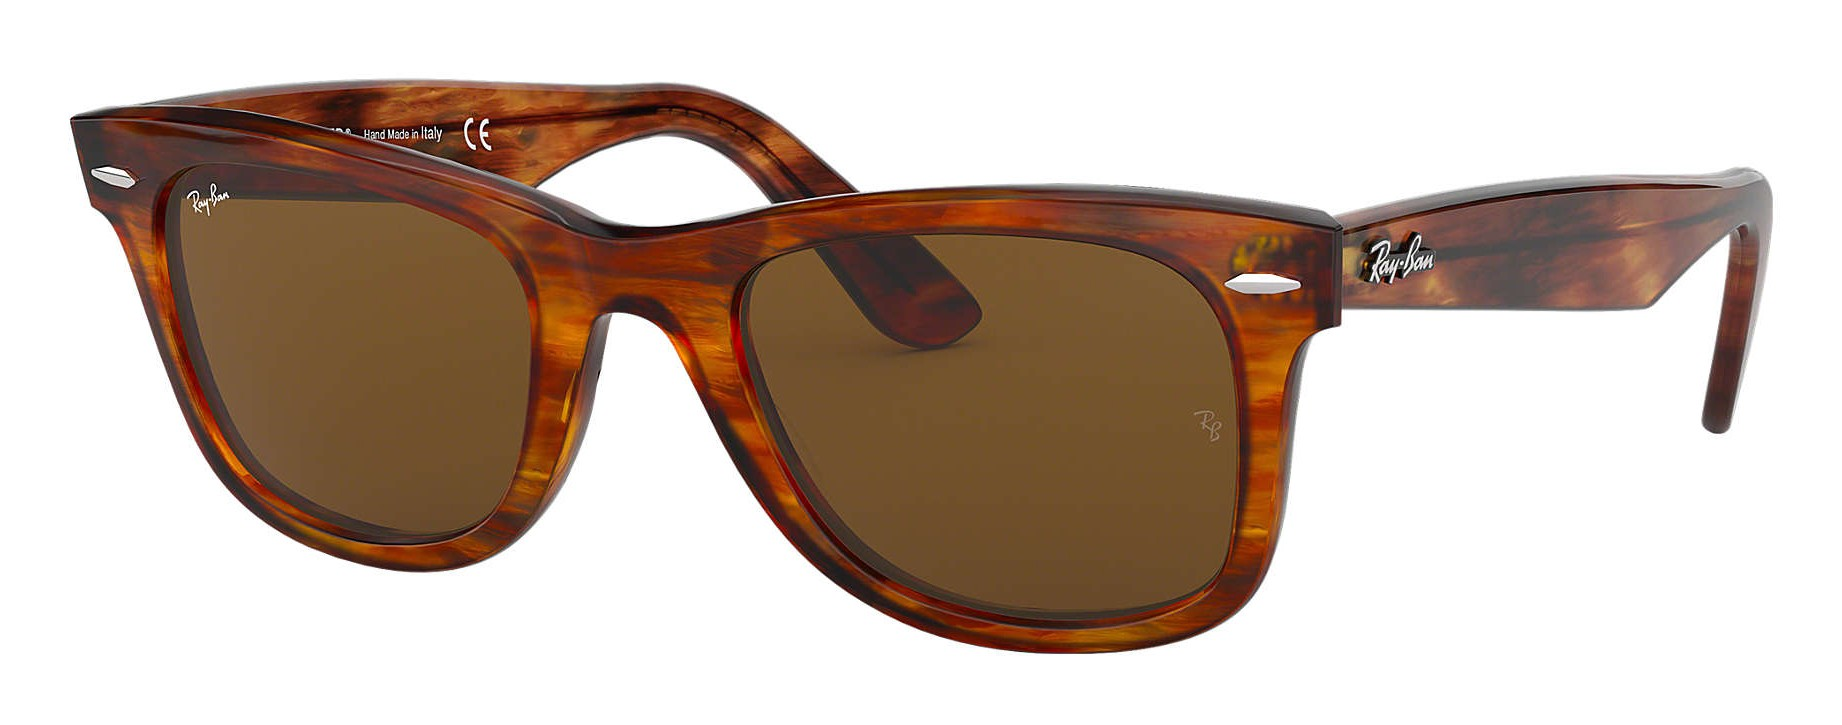 1ffc3ae6fd202 Ray-Ban - RB2140 954 - Original Wayfarer Classic - Light Tortoise - Brown  Classic B-15 Lenses - Sunglass - Ray-Ban Eyewear - Avvenice